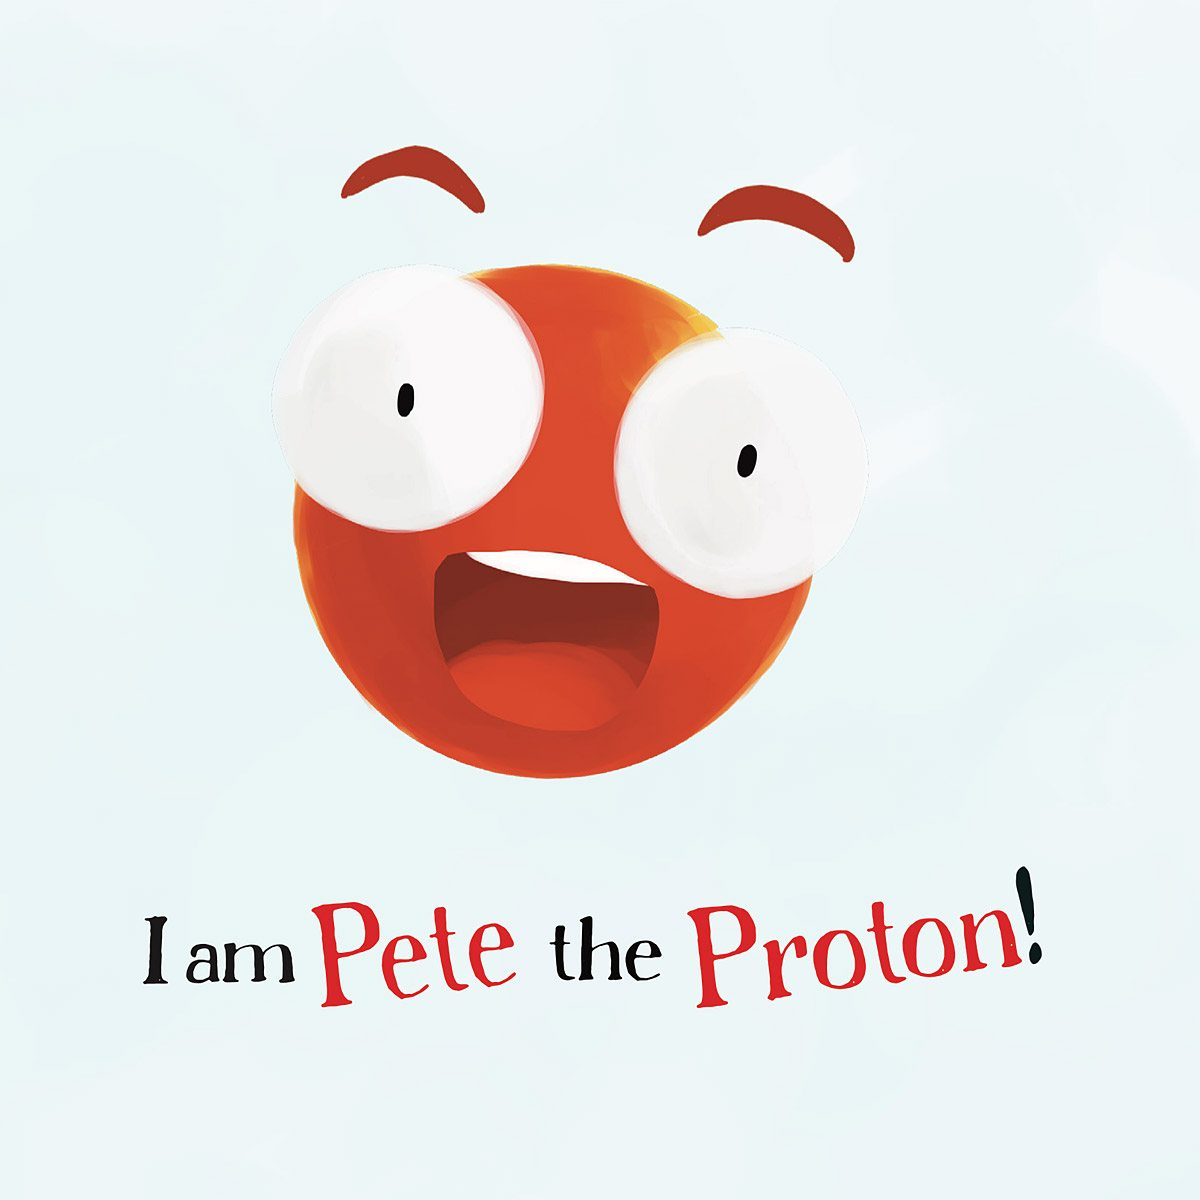 Pete the Proton